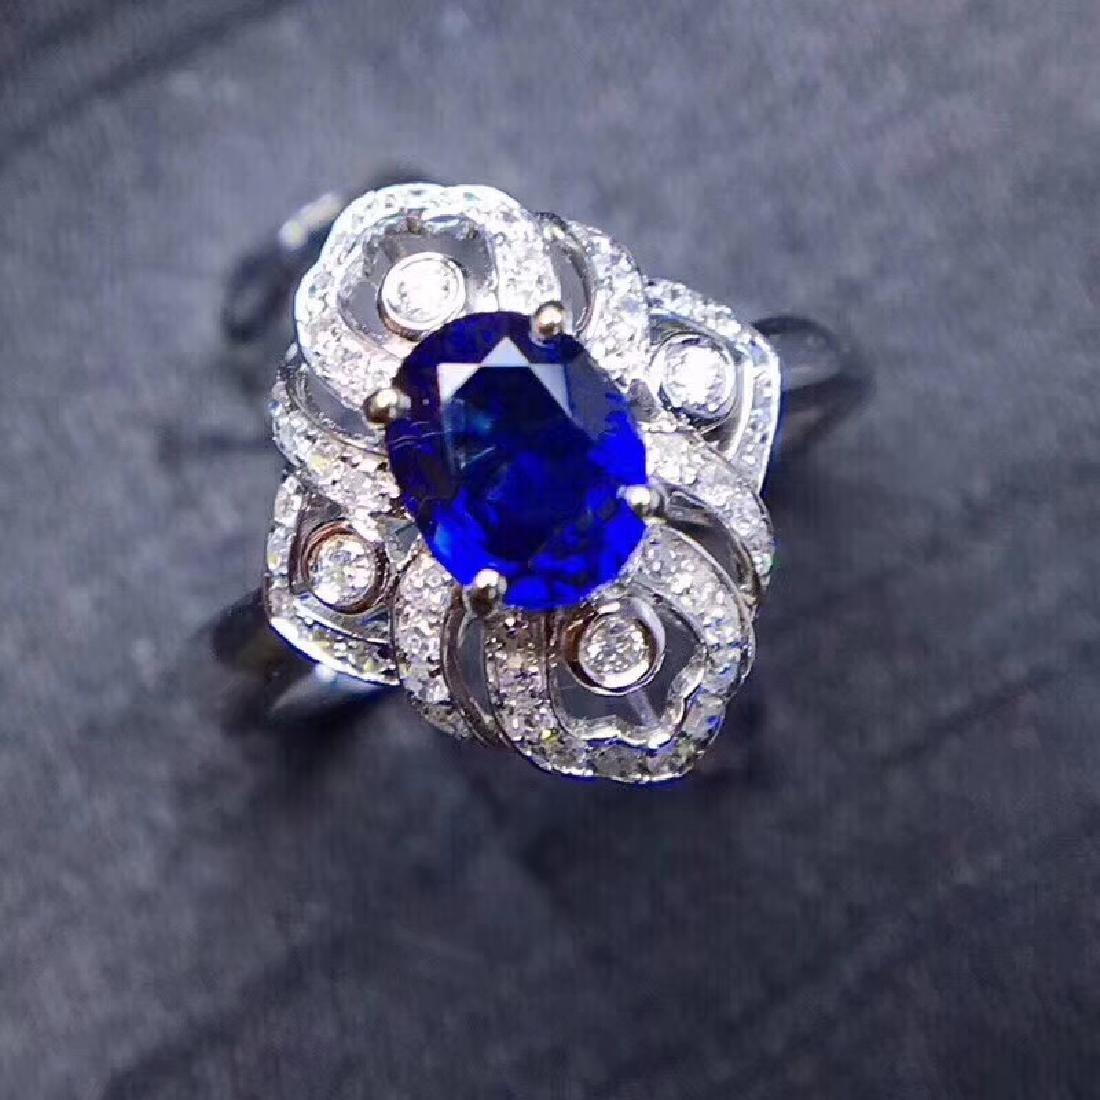 1.18 CTW Sapphire & VS Diamond Ring 18K - 9